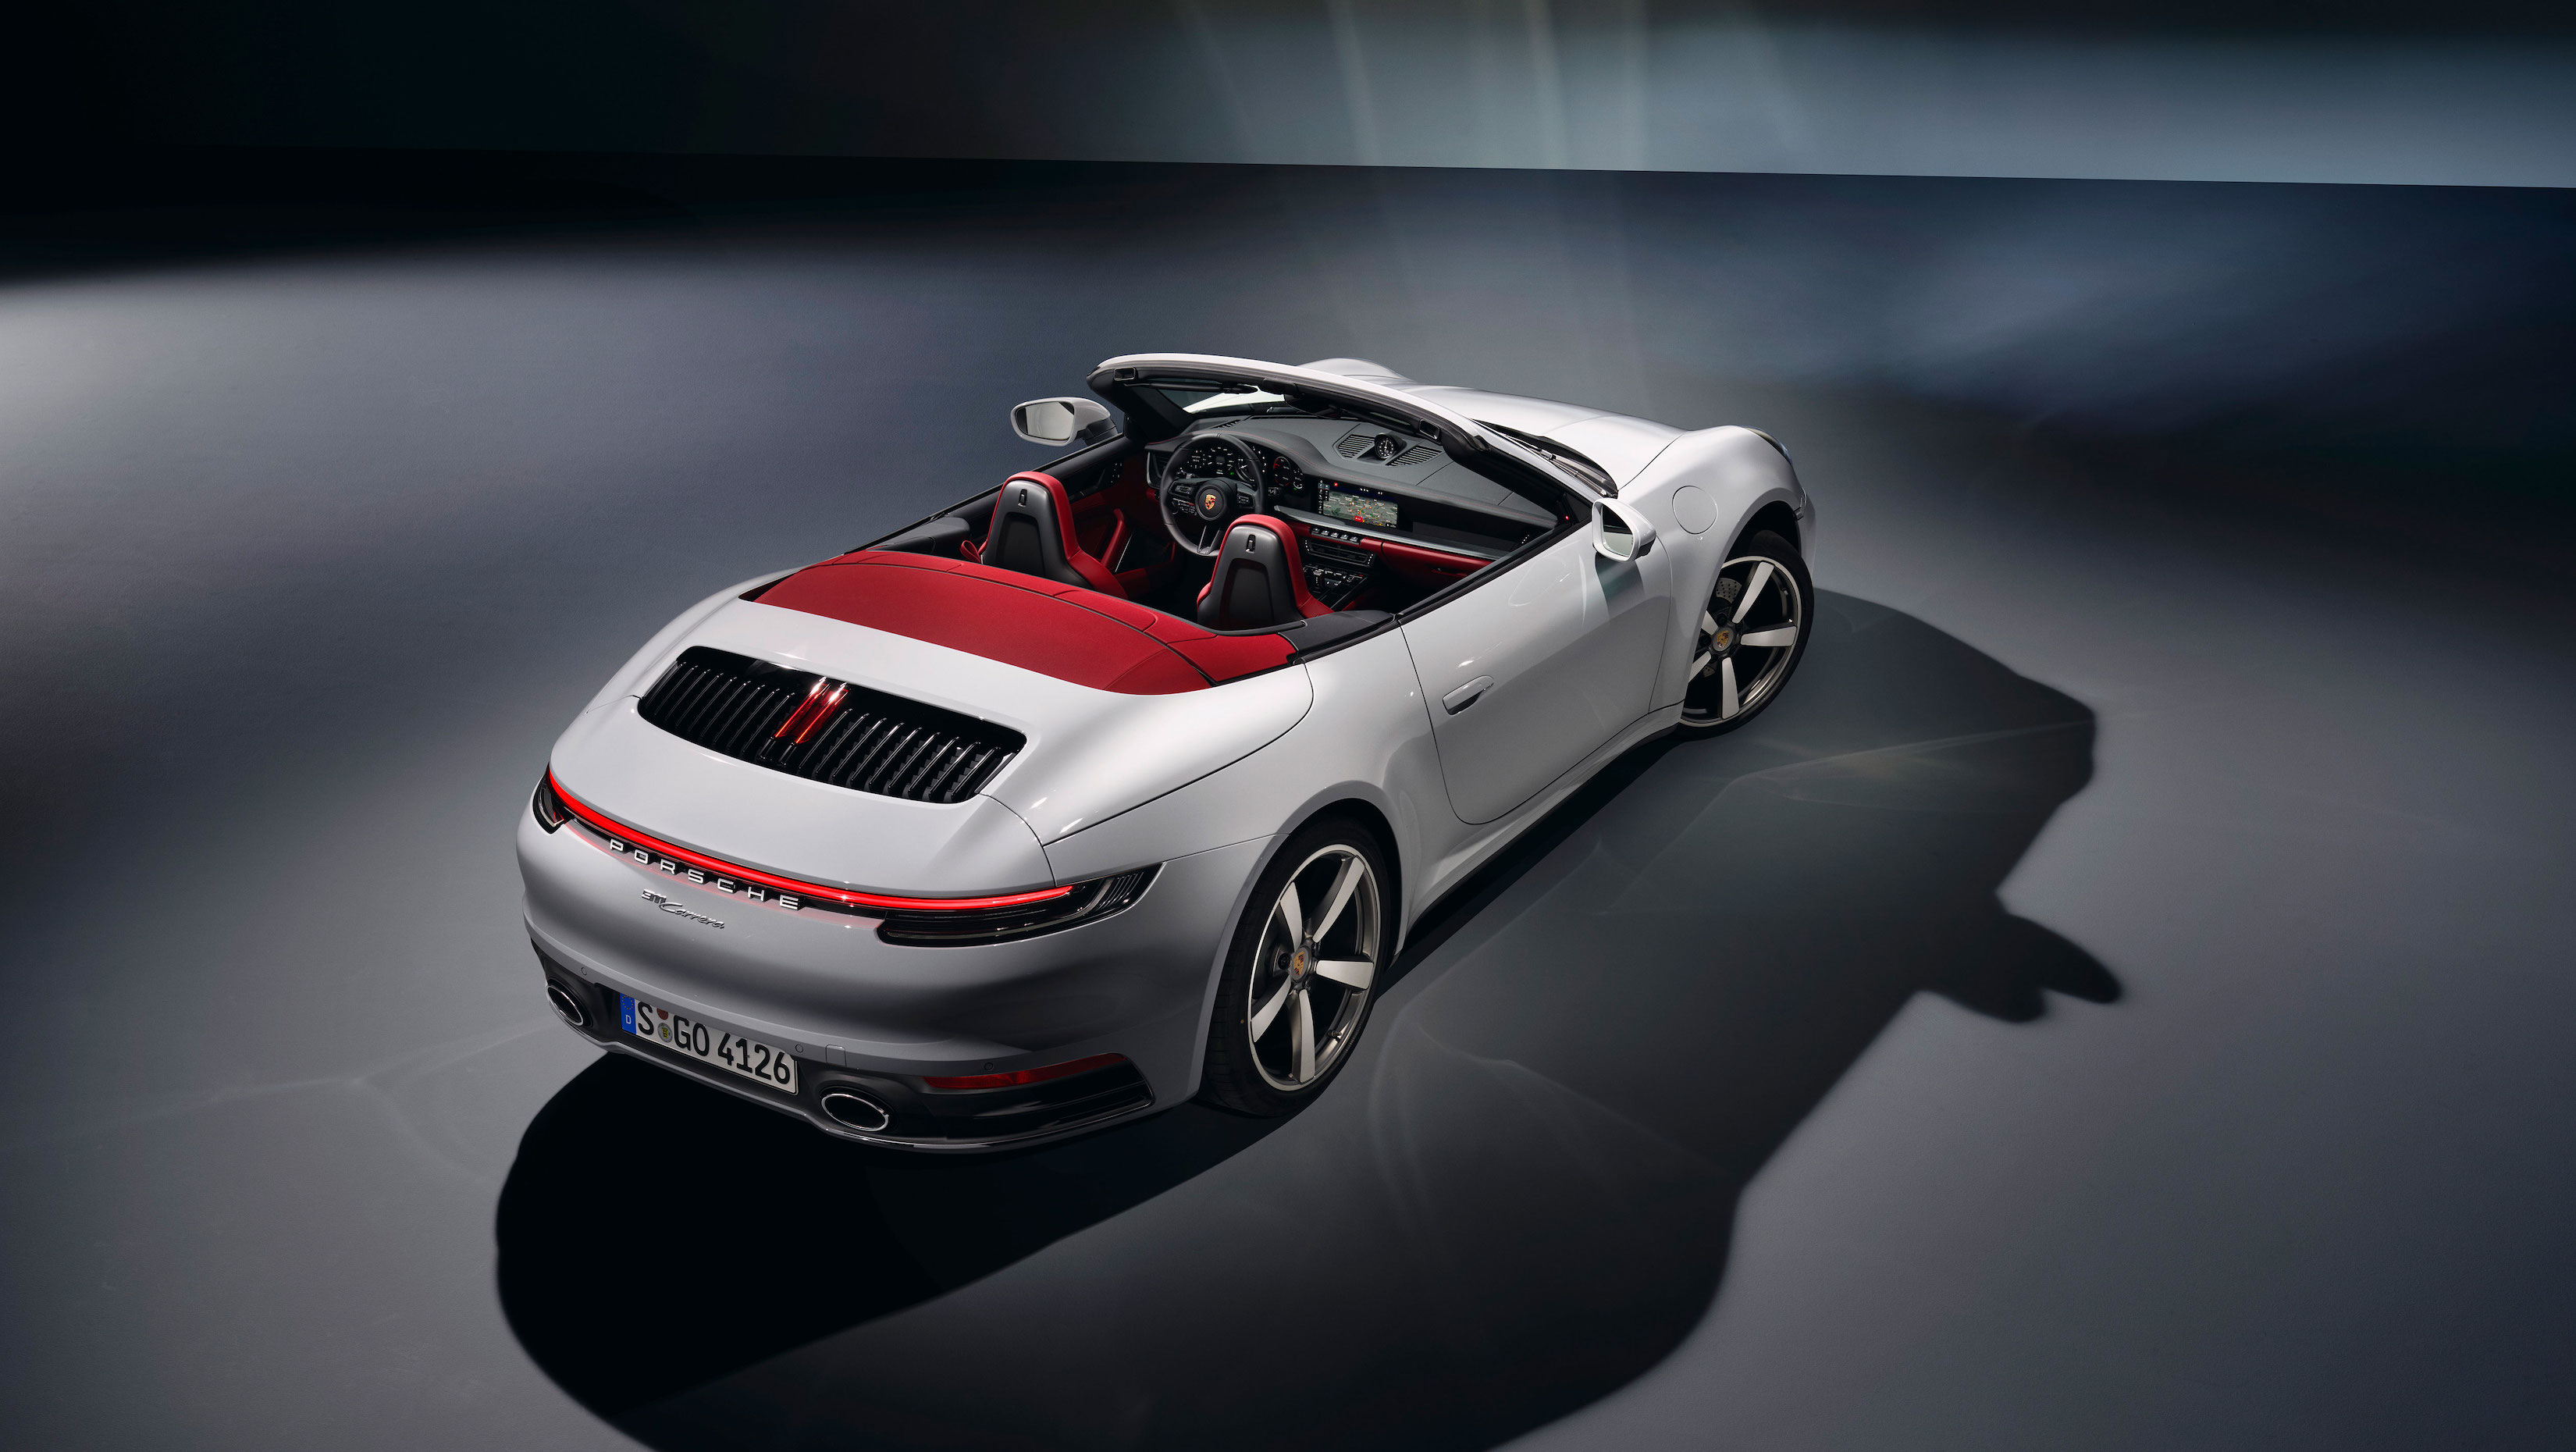 Porsche 911 Carrera cabriolet overhead